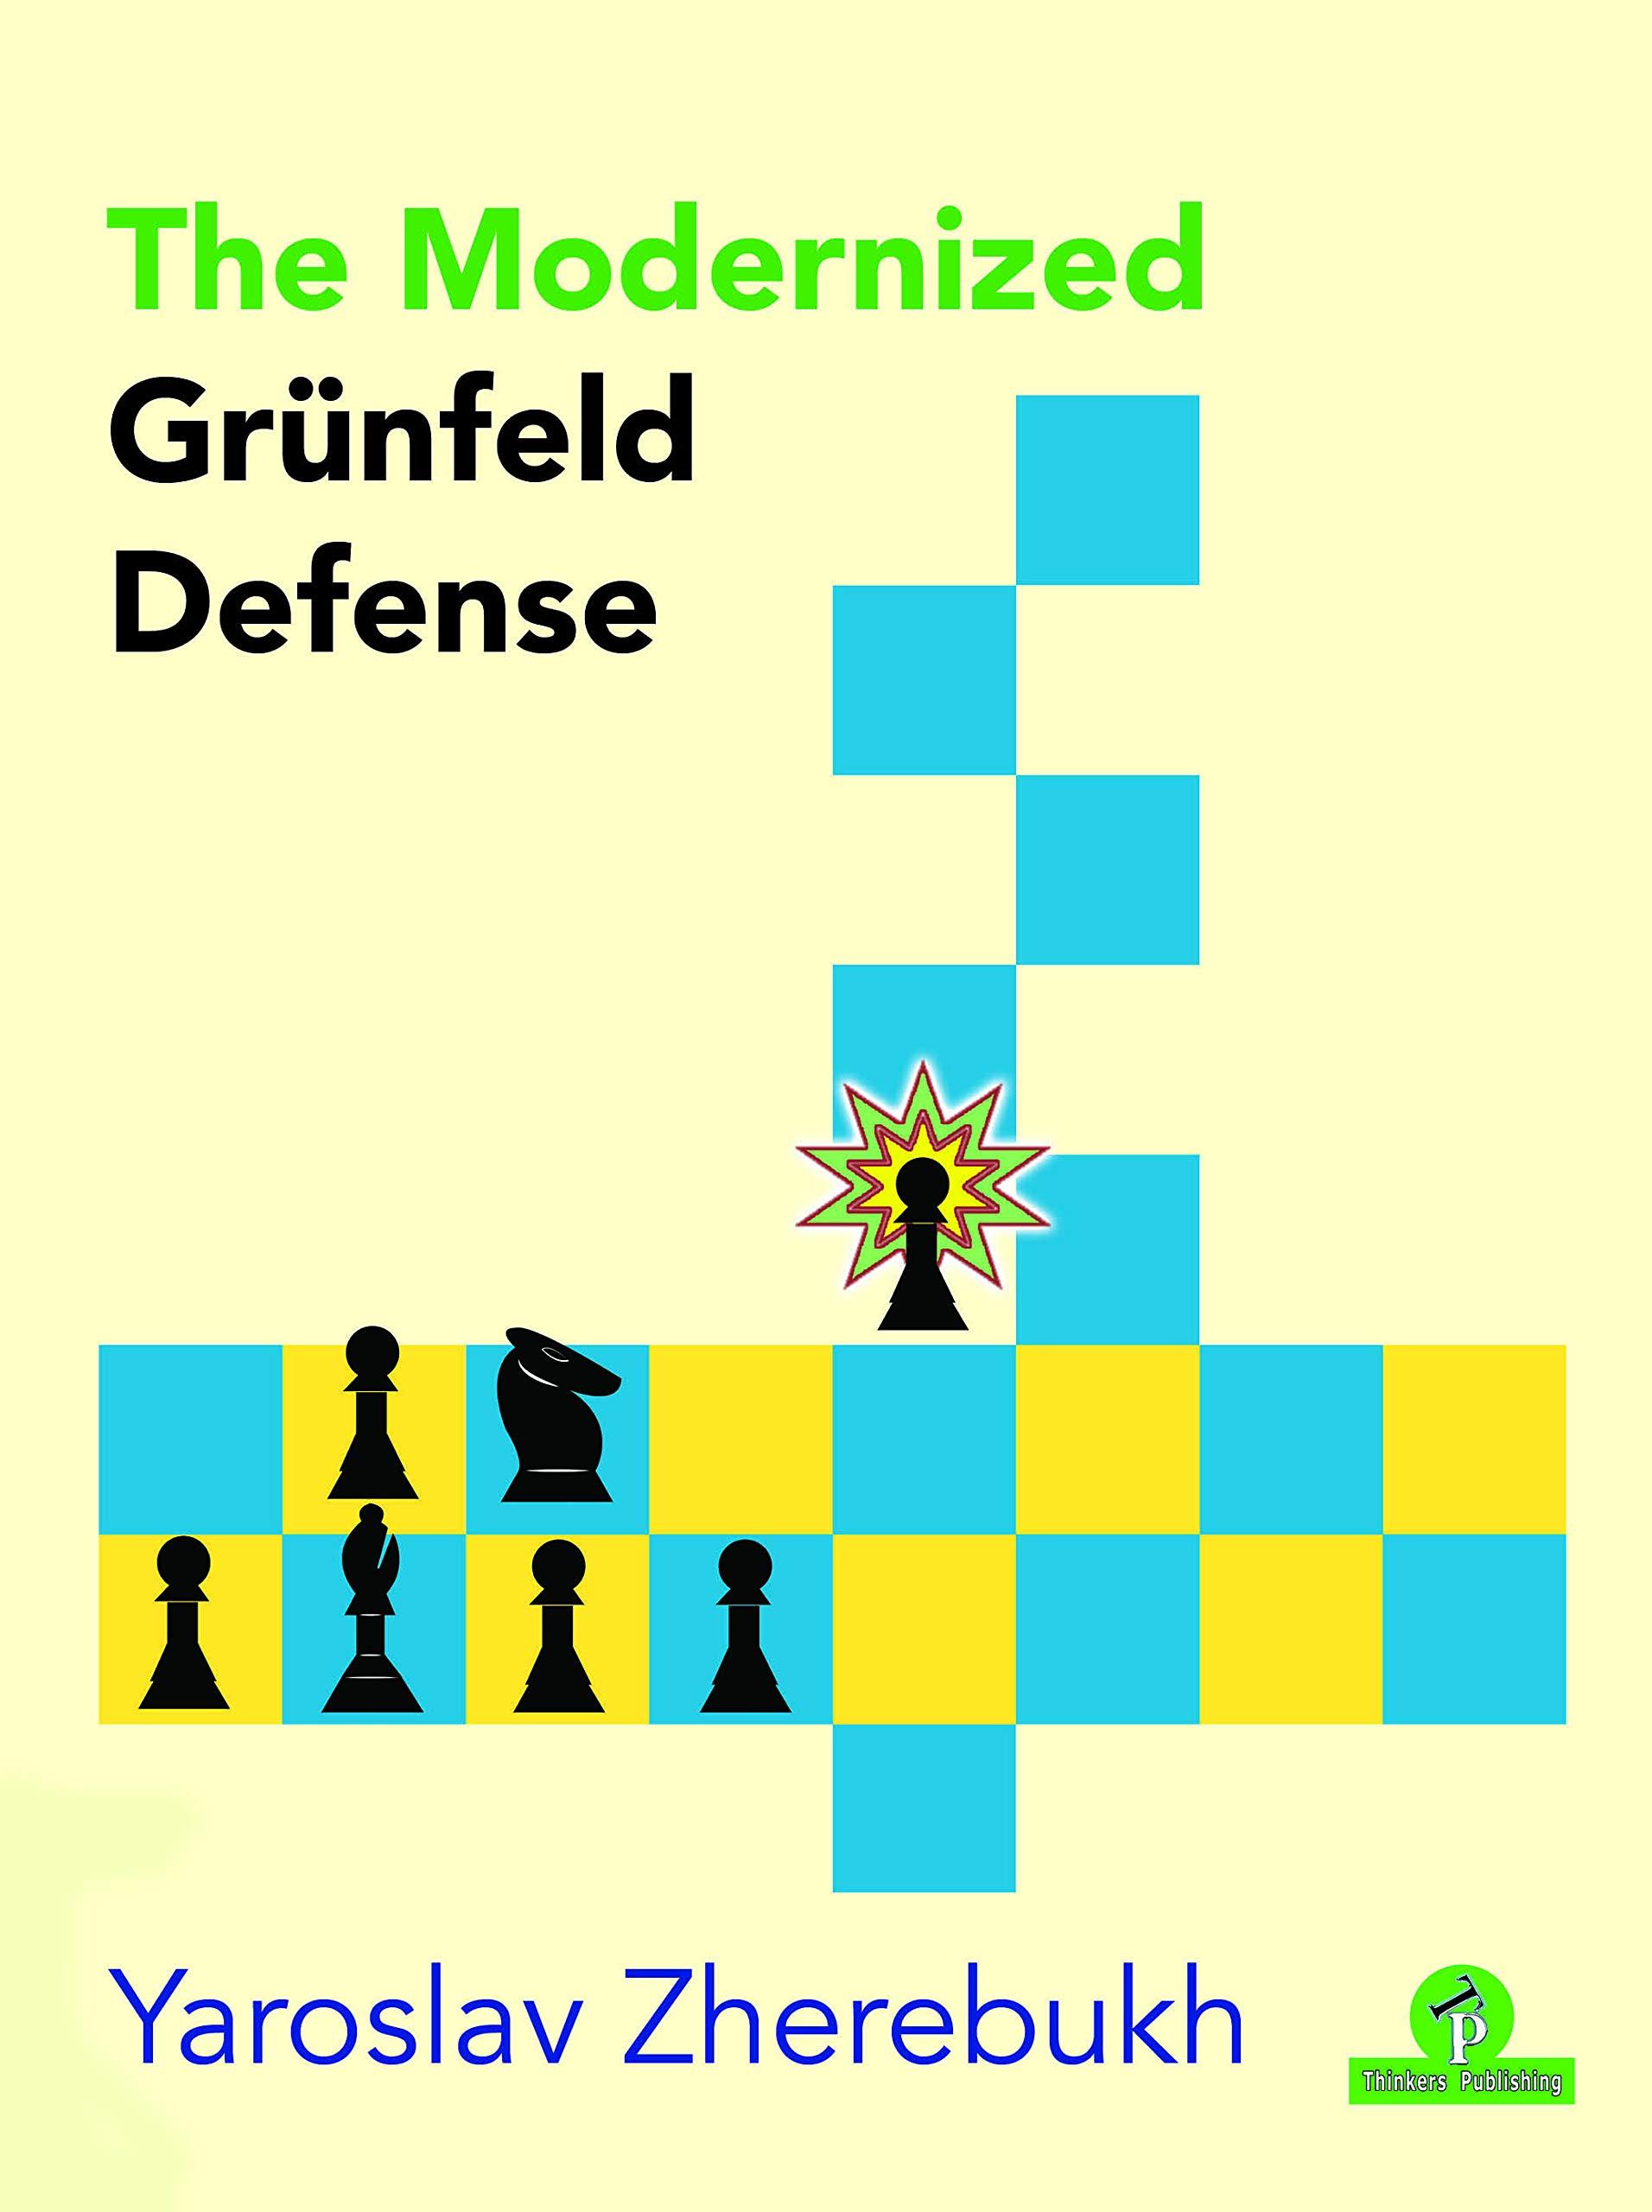 The Modernized Grünfeld Defense